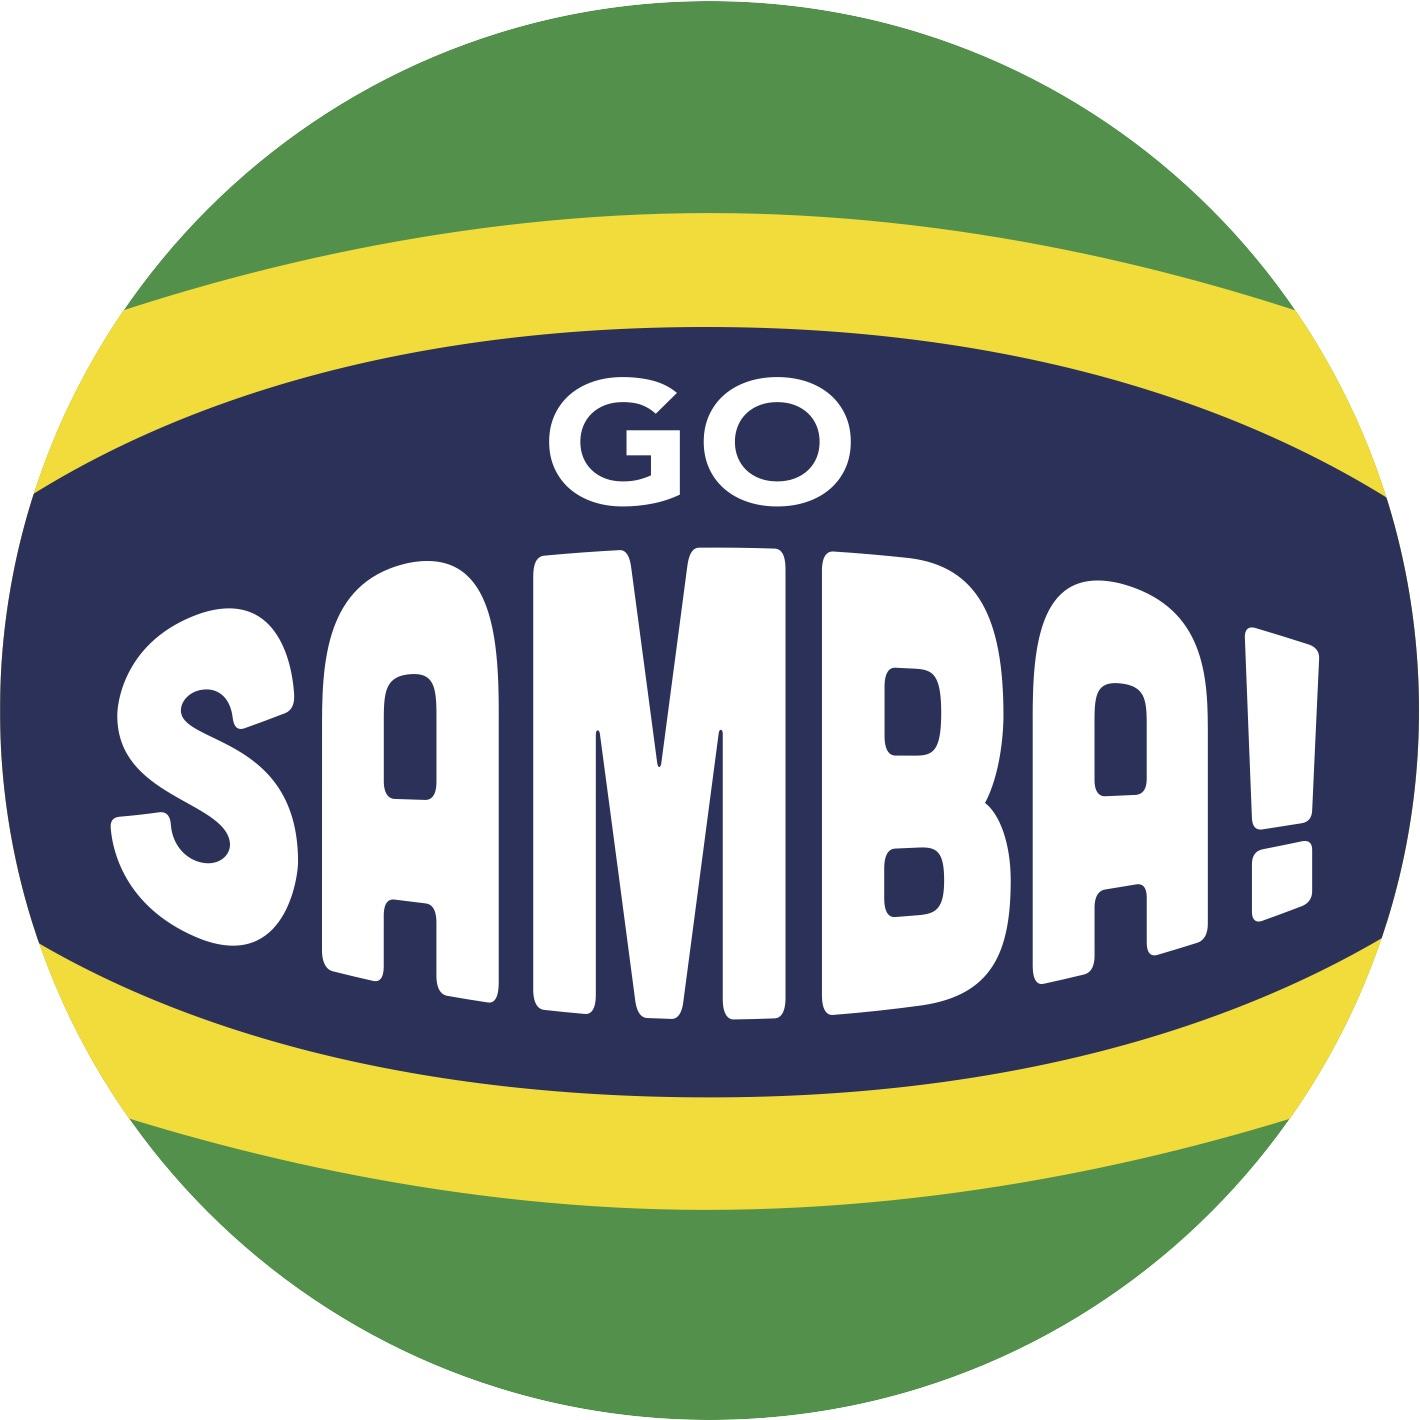 This episode sponsored by GoSamba.net -